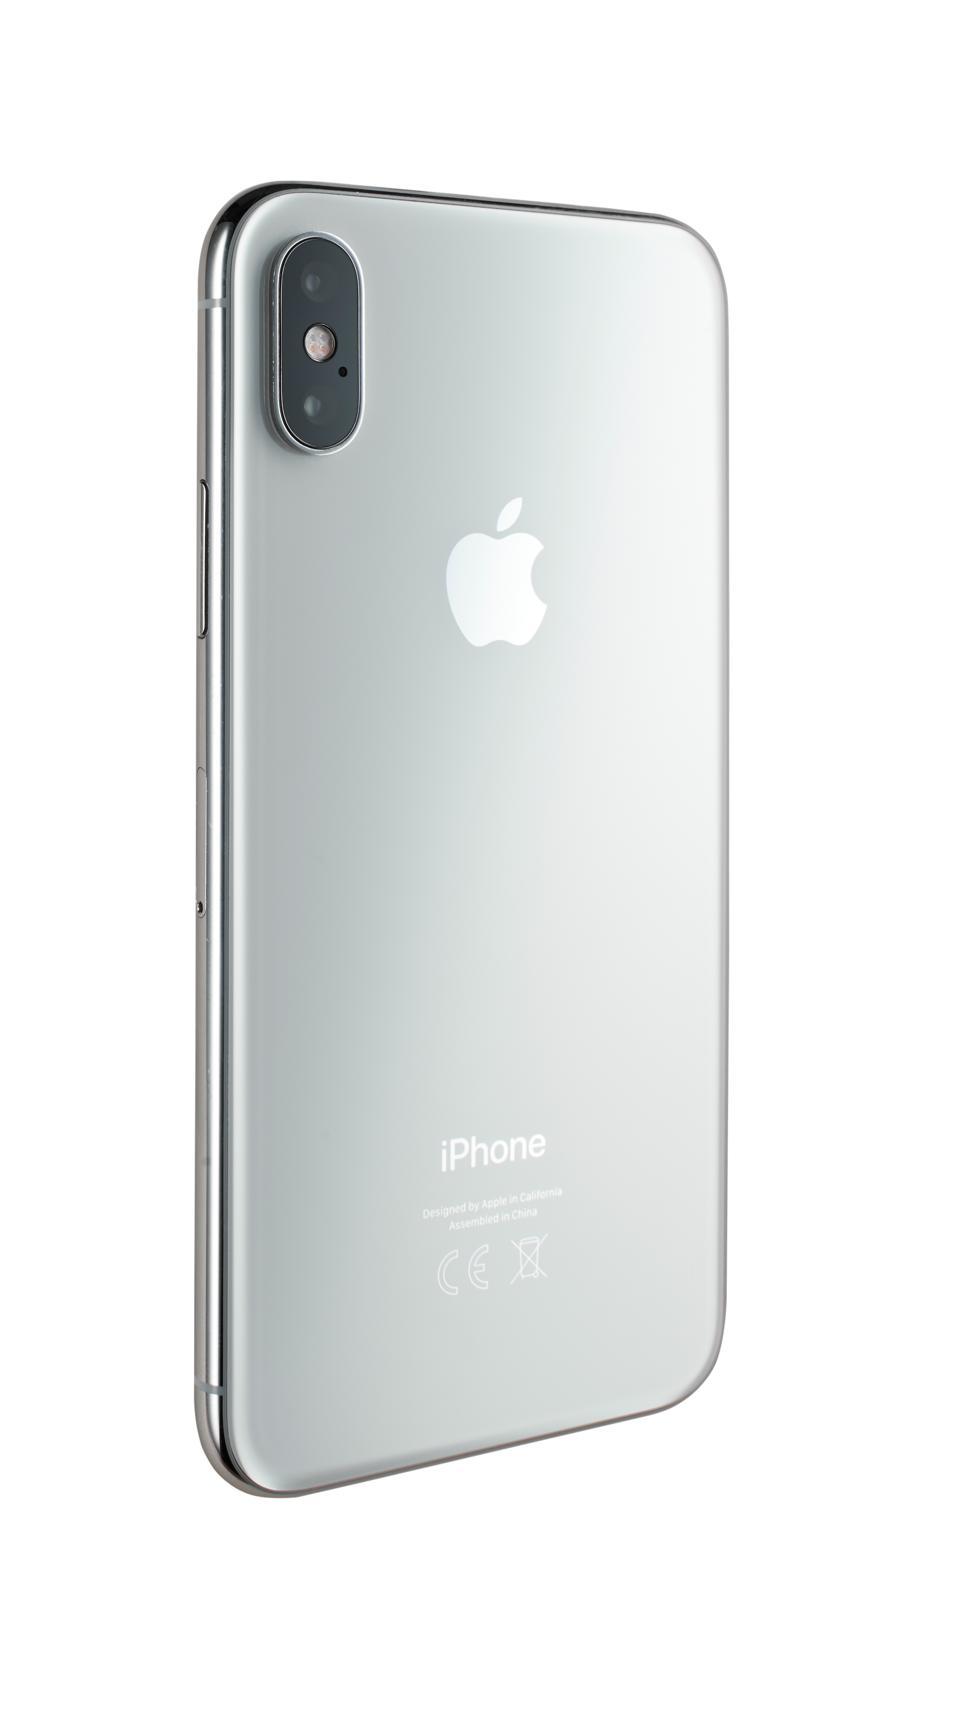 Apple iPhone X iOS jailbreak